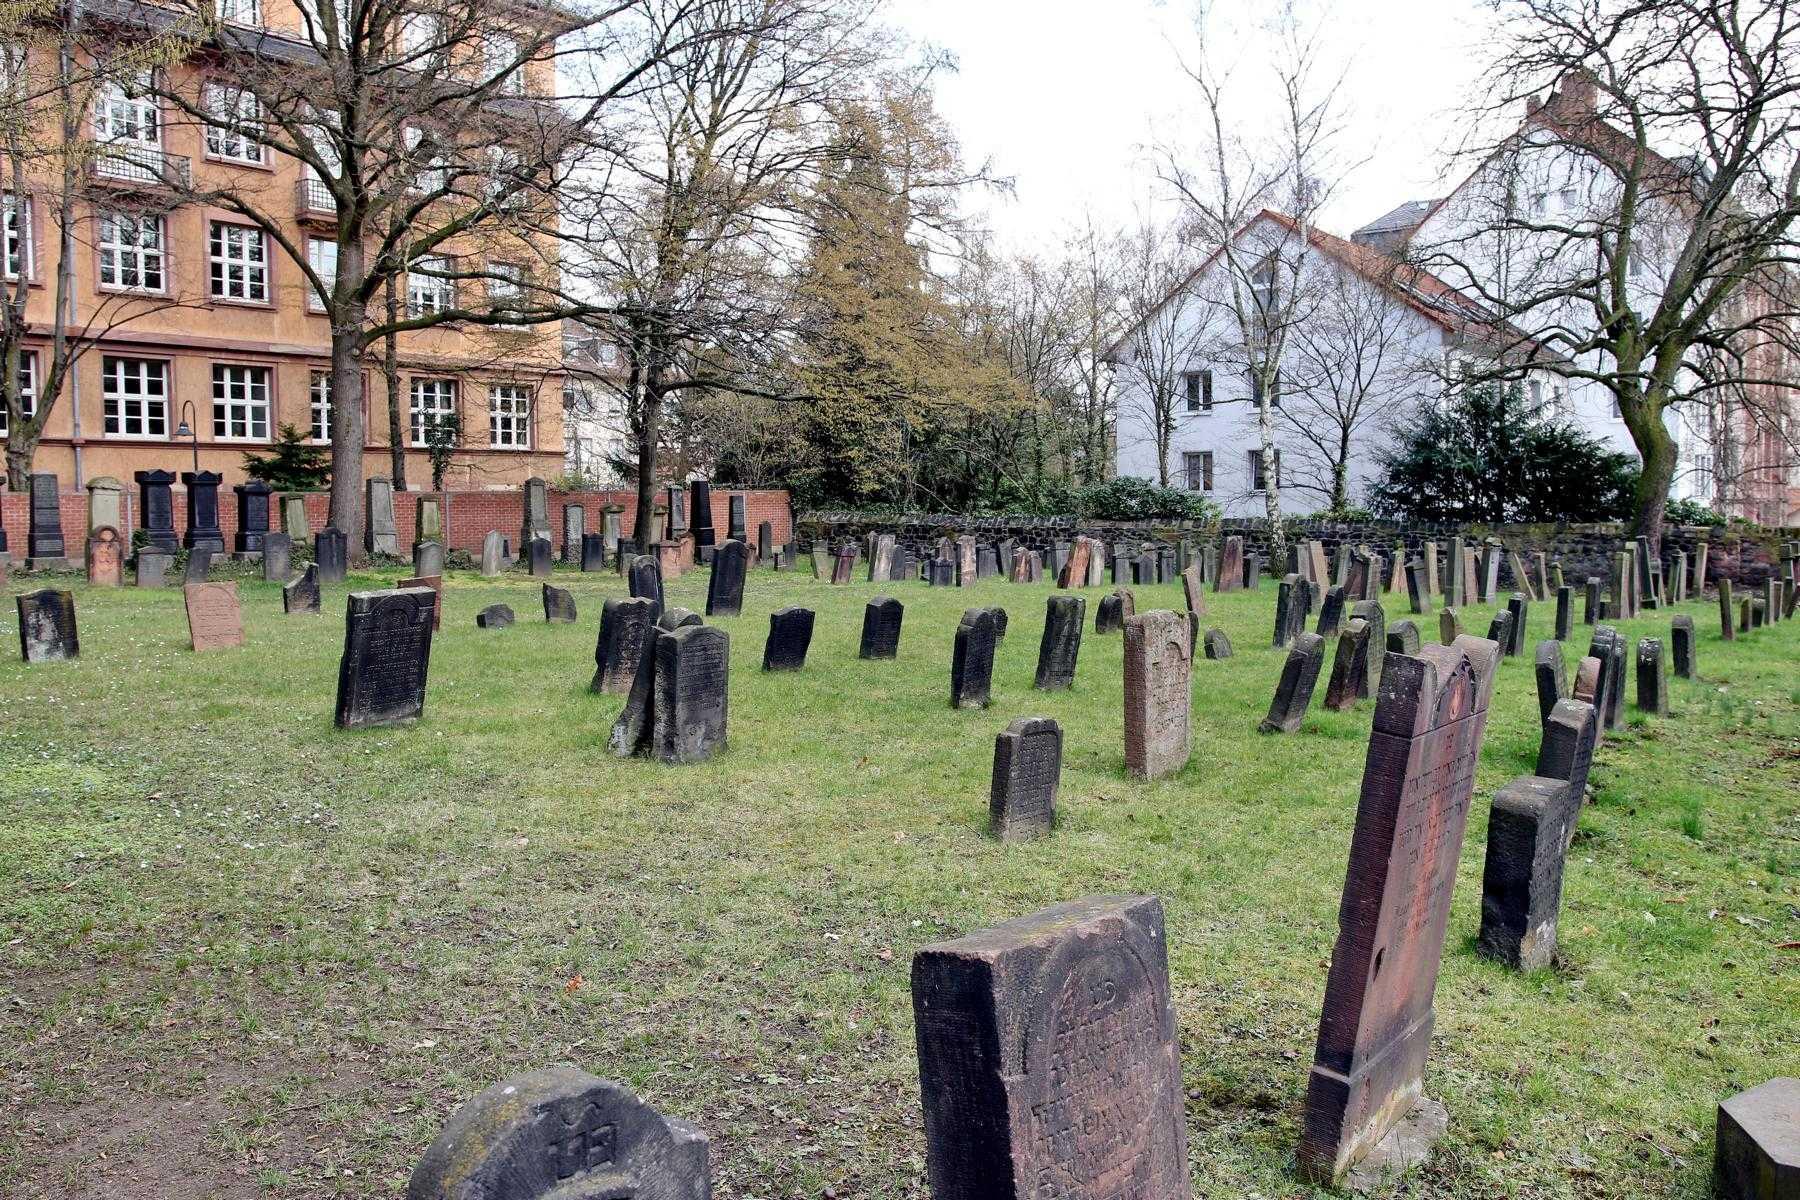 http://www.alemannia-judaica.de/images/Images%20403/Bockenheim%20Friedhof%20K1600_GH1A0758.jpg